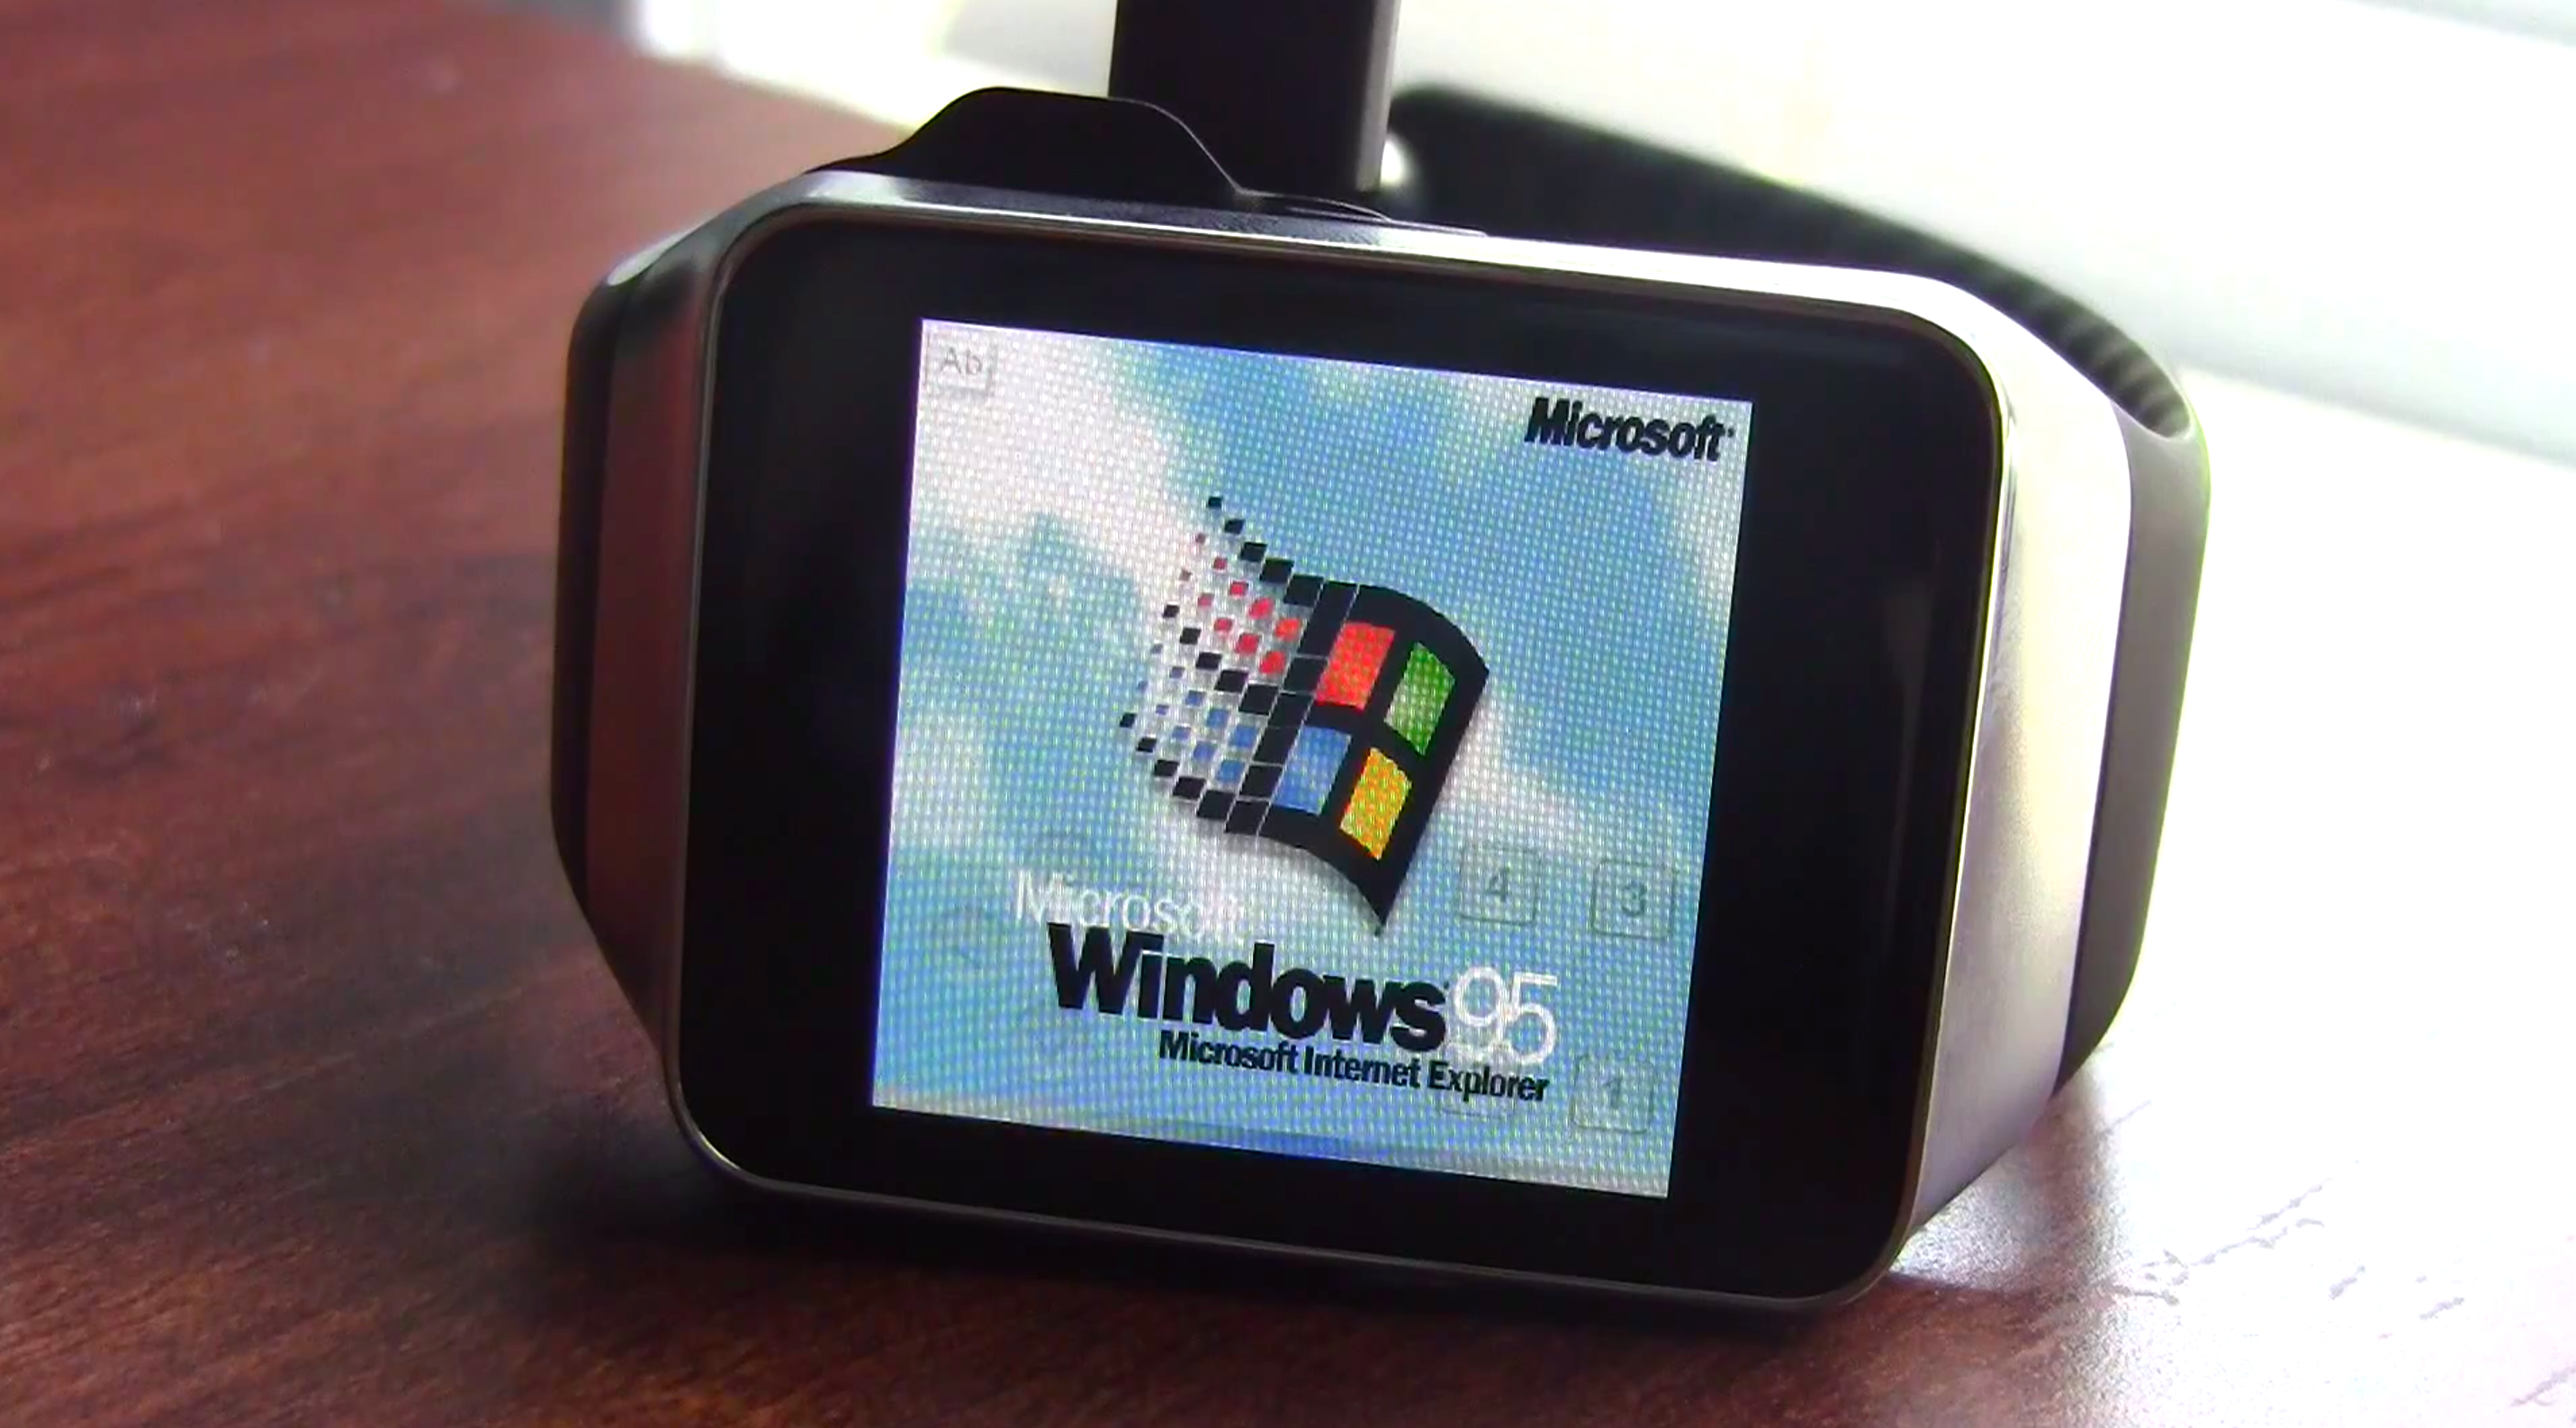 Windows 95 Running On Android Wear